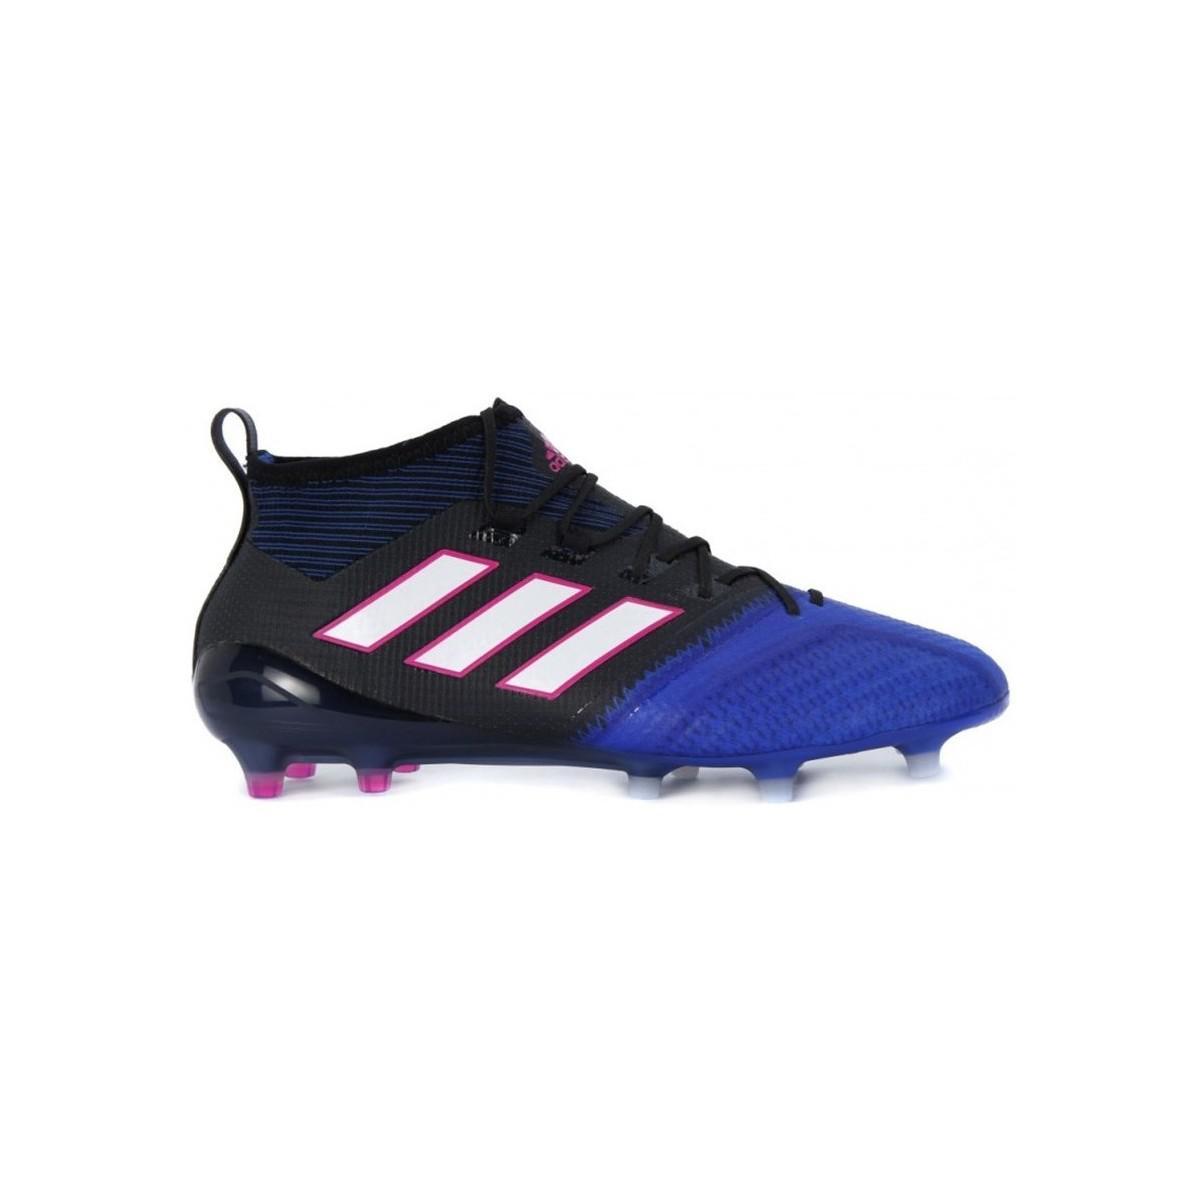 5d09e596f4d Adidas Ace 171 Primeknit Fg Men s Football Boots In Black in Black ...